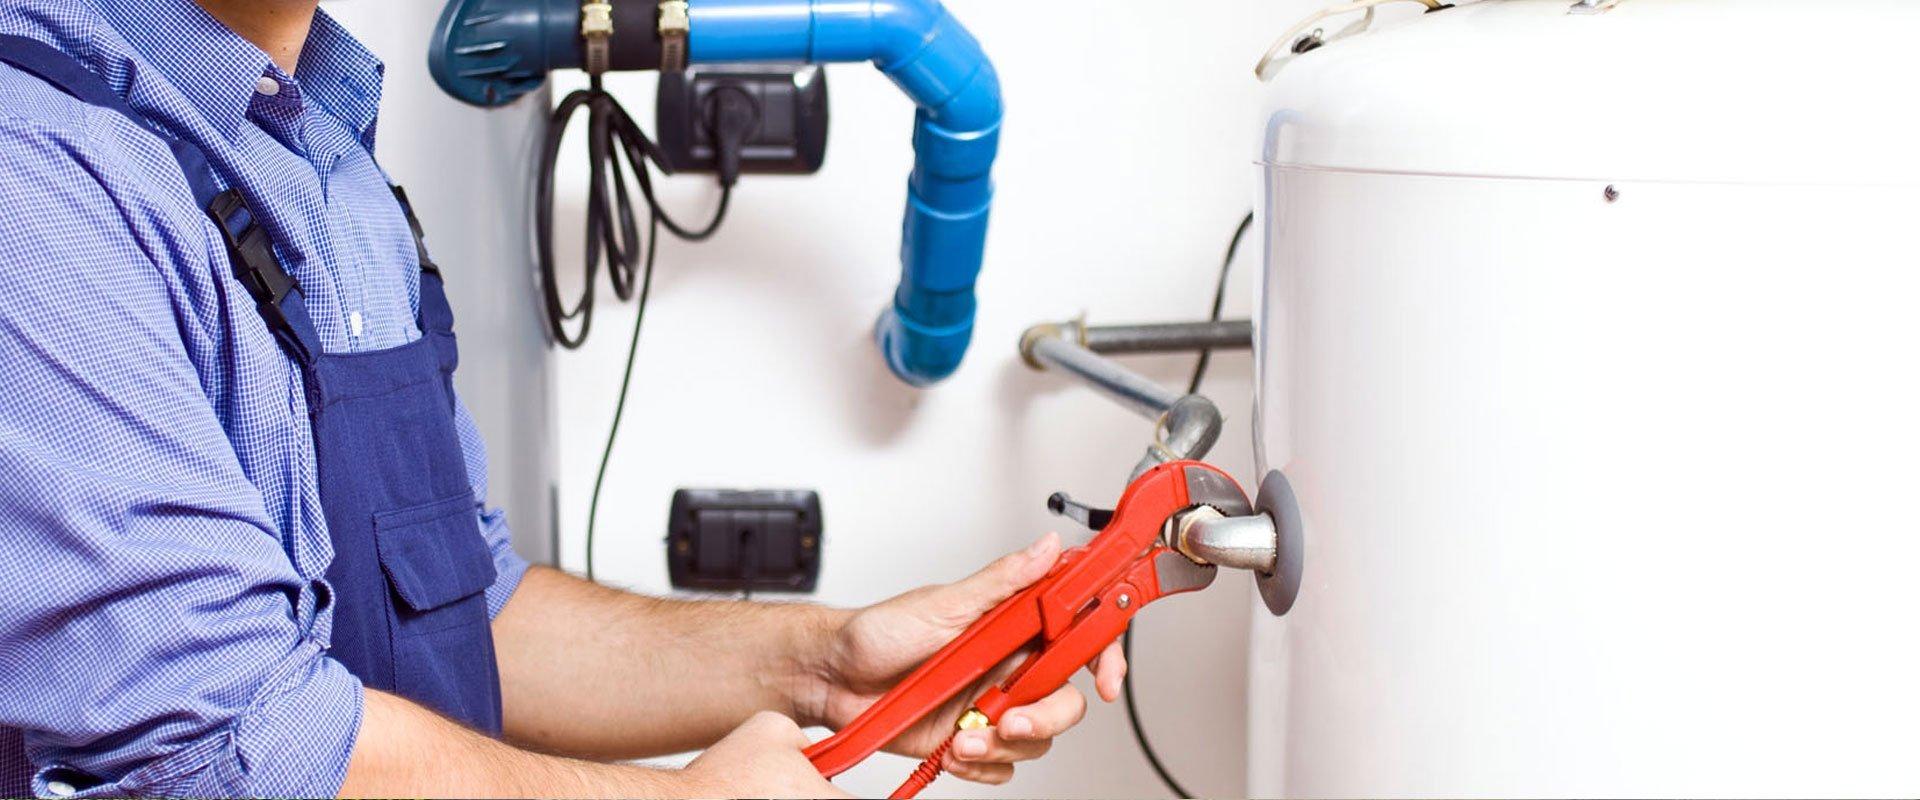 Fortable Climatrol Wiring Diagram Auto Electrical. Climatrol Wiring Diagram Auto Electrical. Wiring. Climatrol Wiring Diagram At Scoala.co